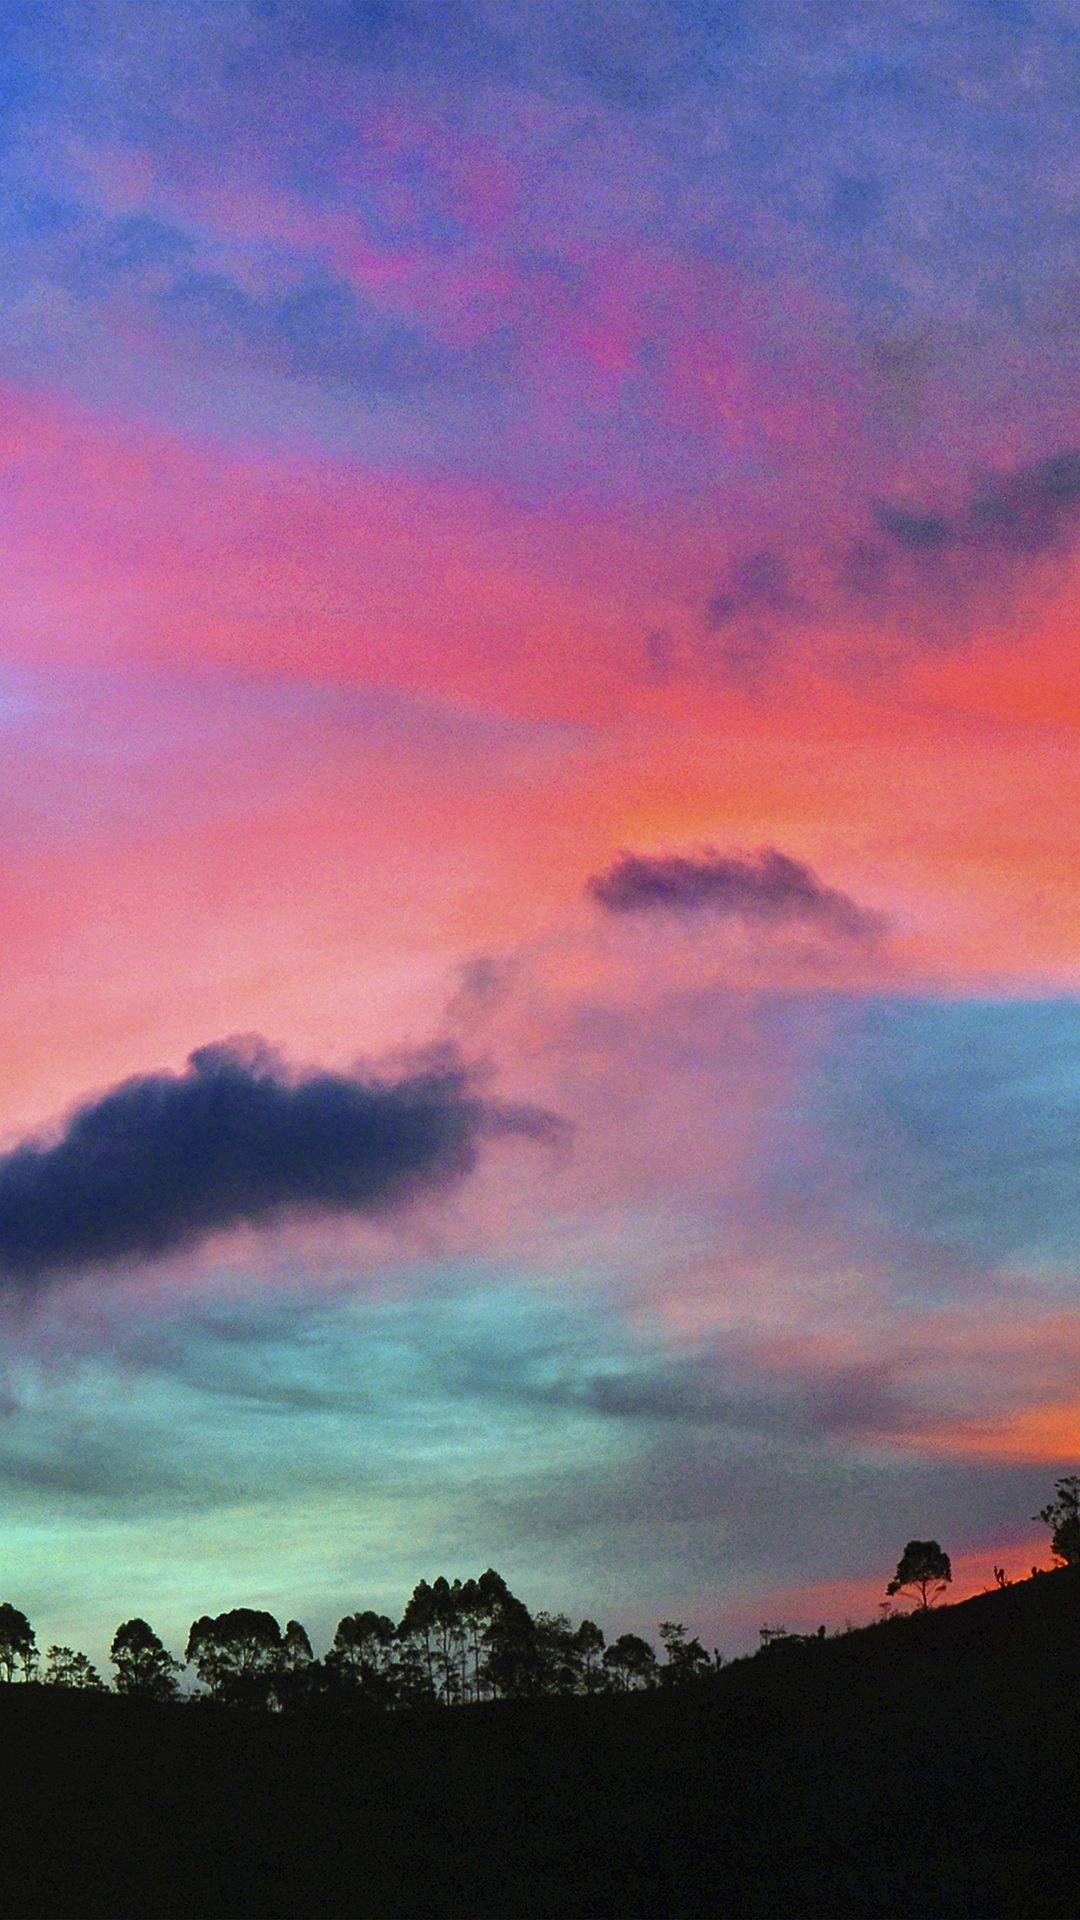 Sky Rainbow Cloud Sunset Nature